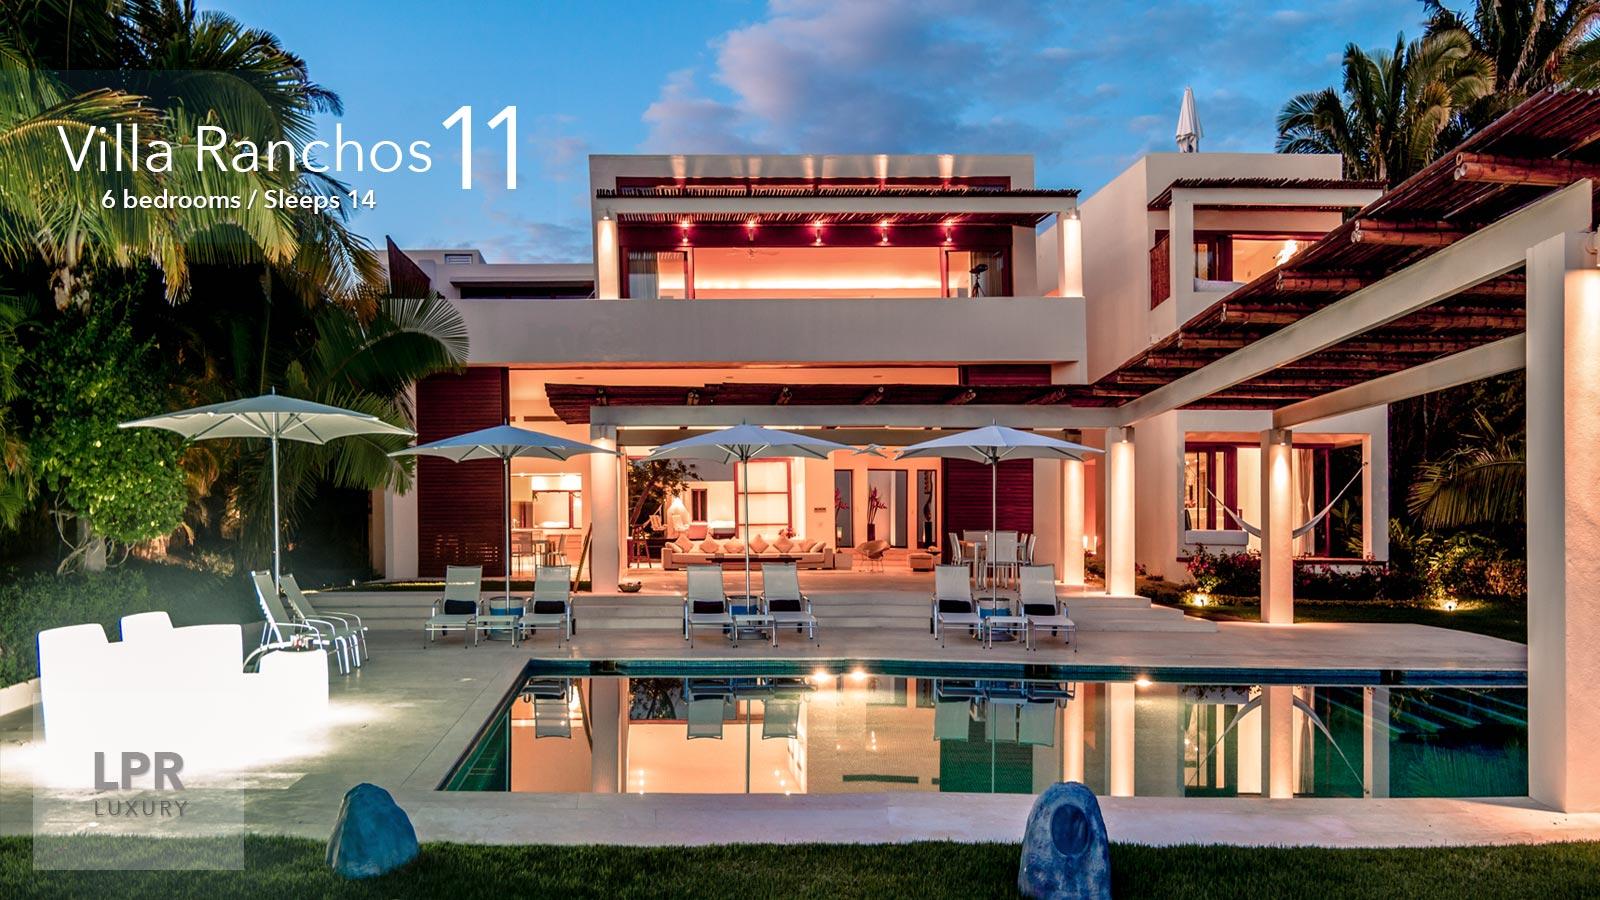 Villa Ranchos 11 - Luxury Vacation Rental Villa at the Punta Mita Resort, Riviera Nayarit, Mexico